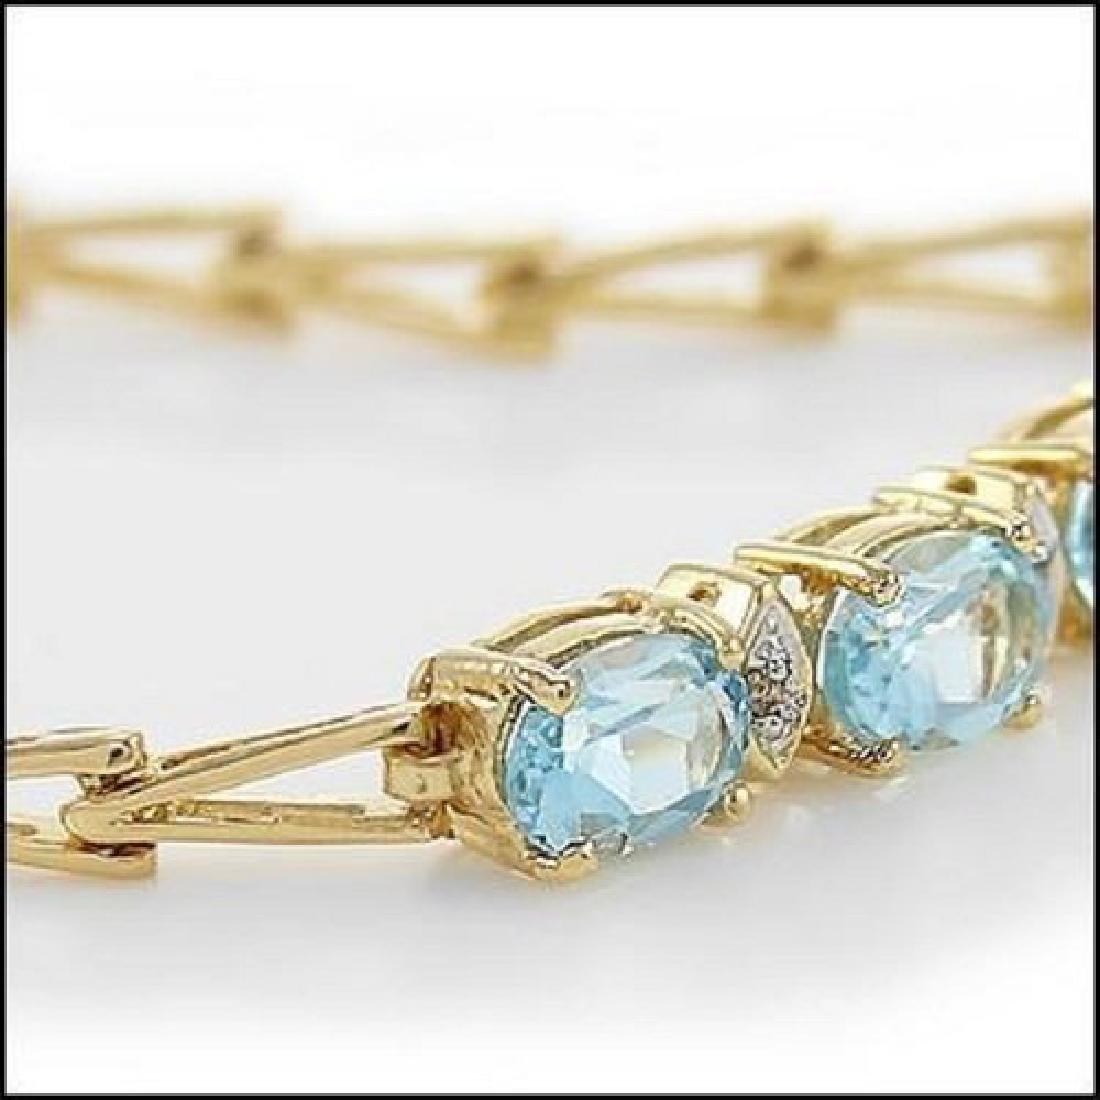 4.29 Ct Blue Topaz Diamond Fine Designer Bracelet $990 - 2